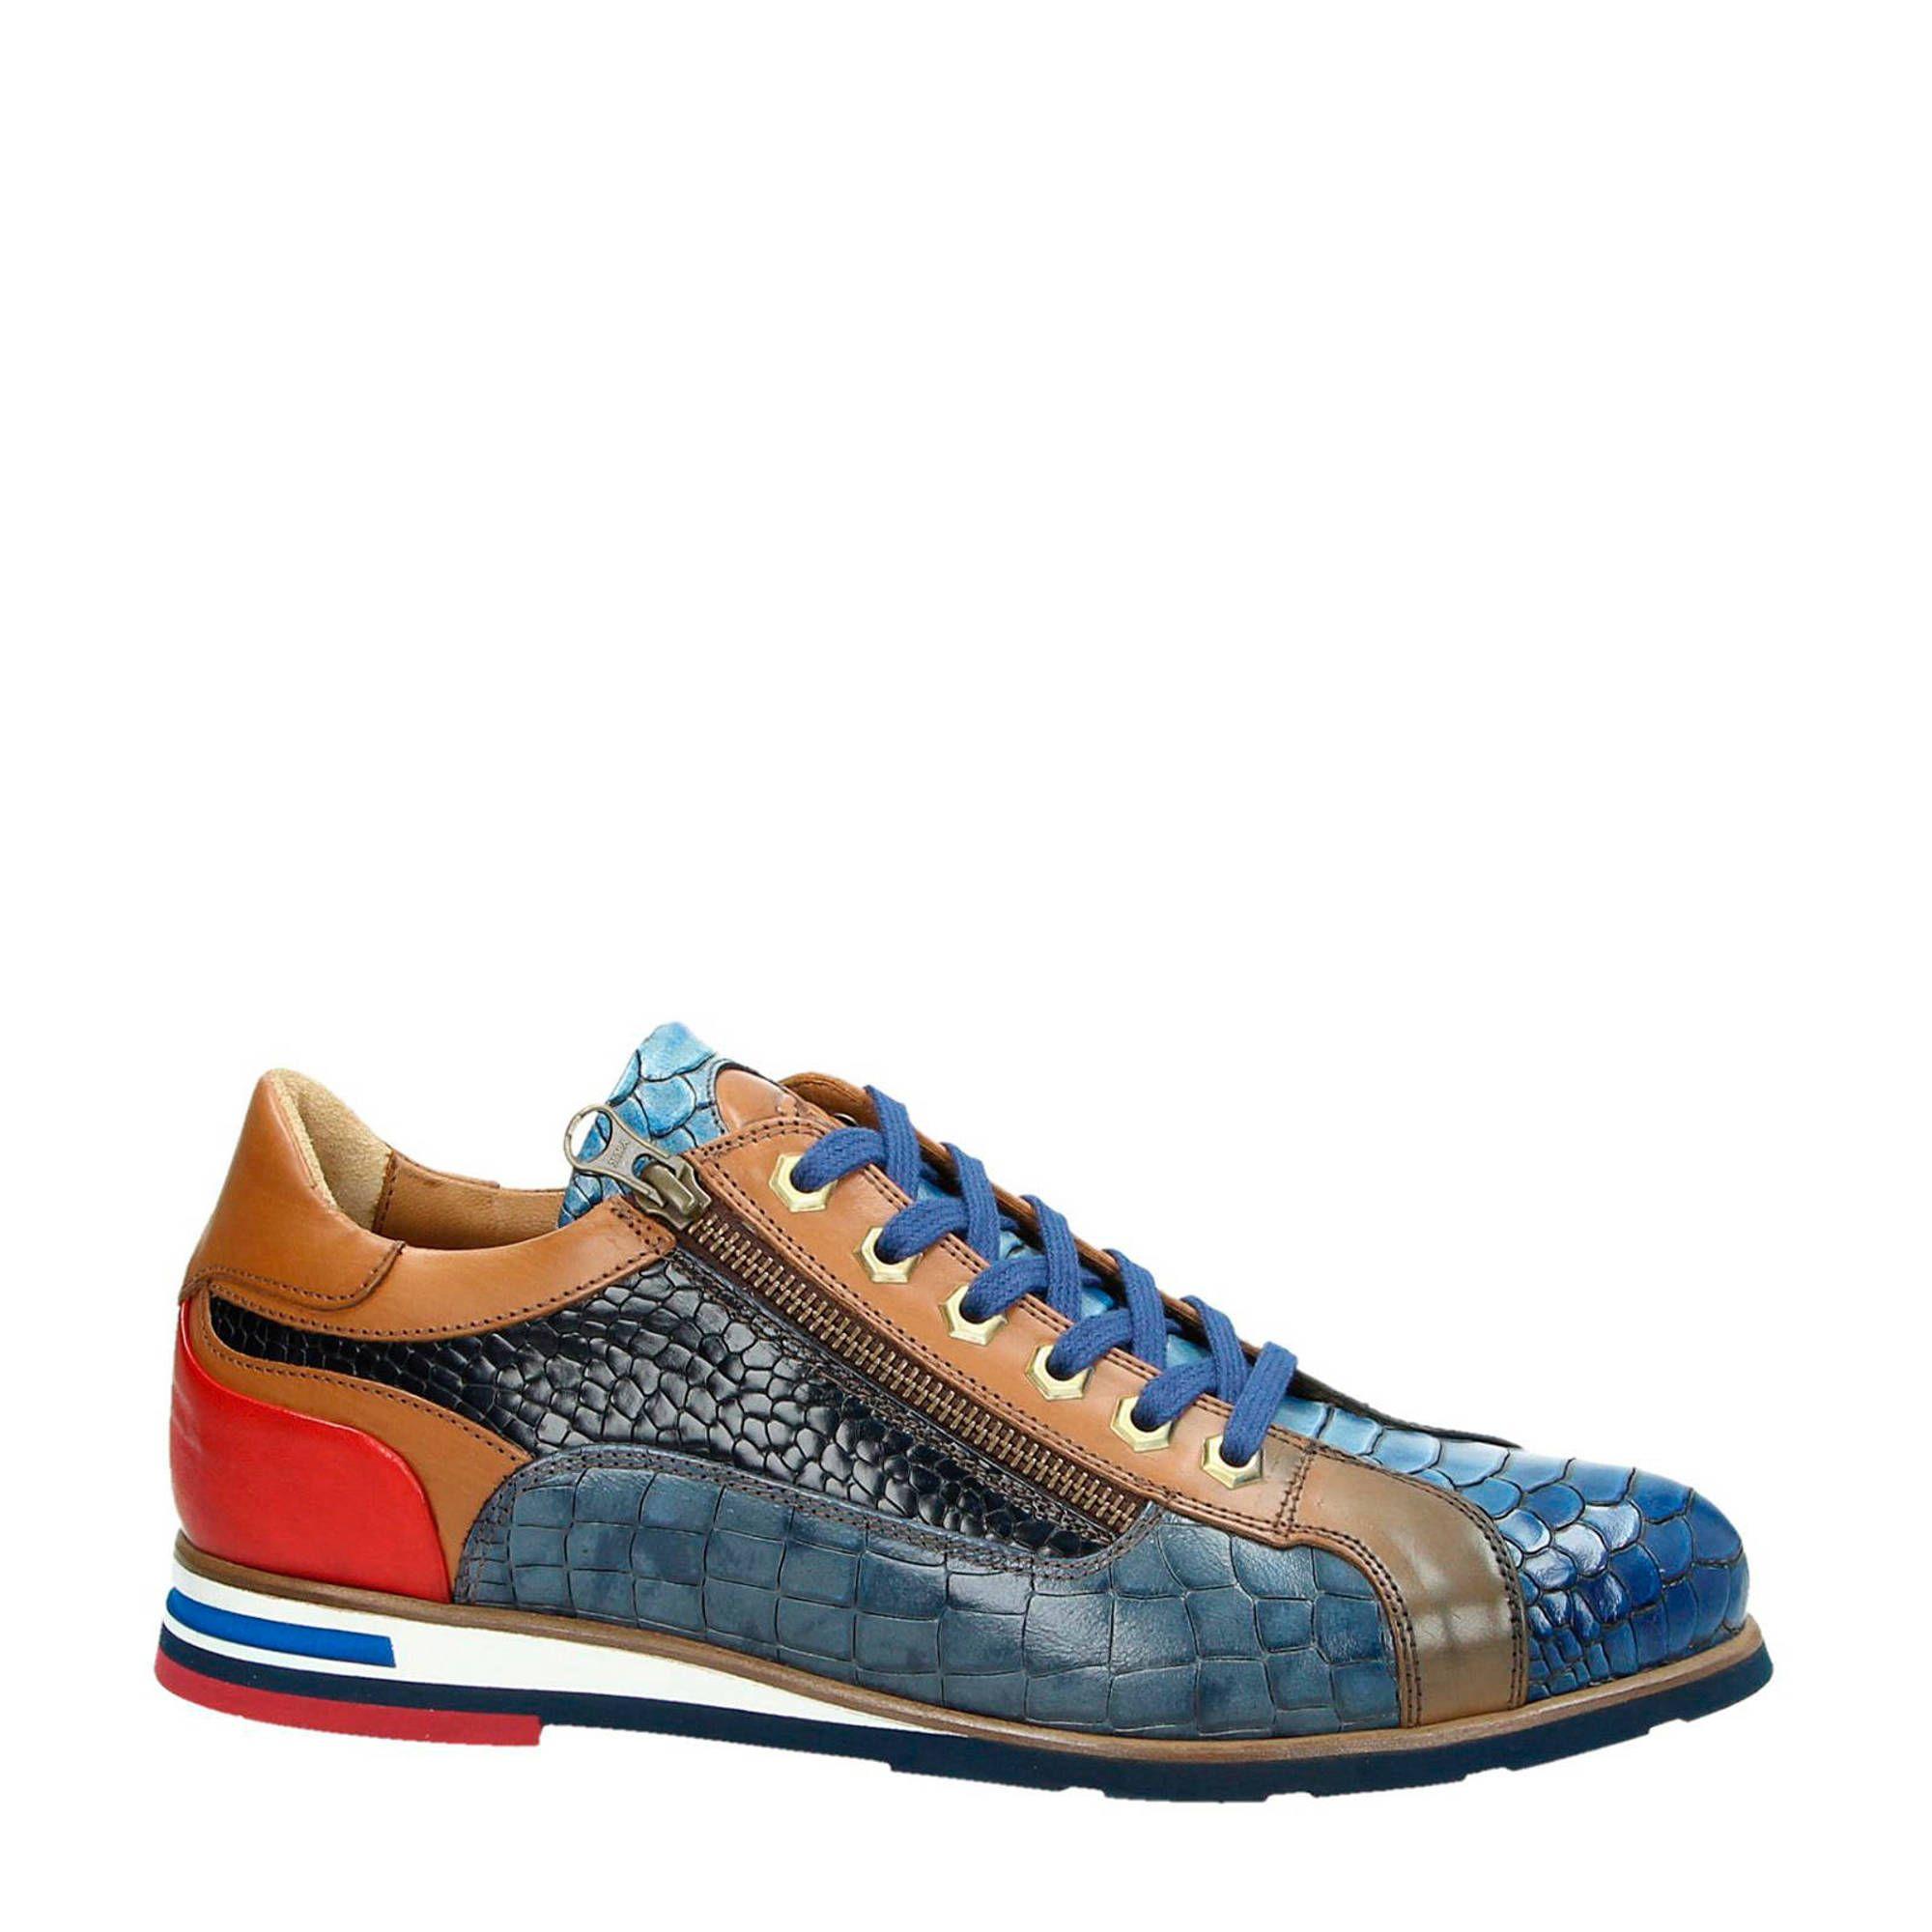 adidas yeezy blauw